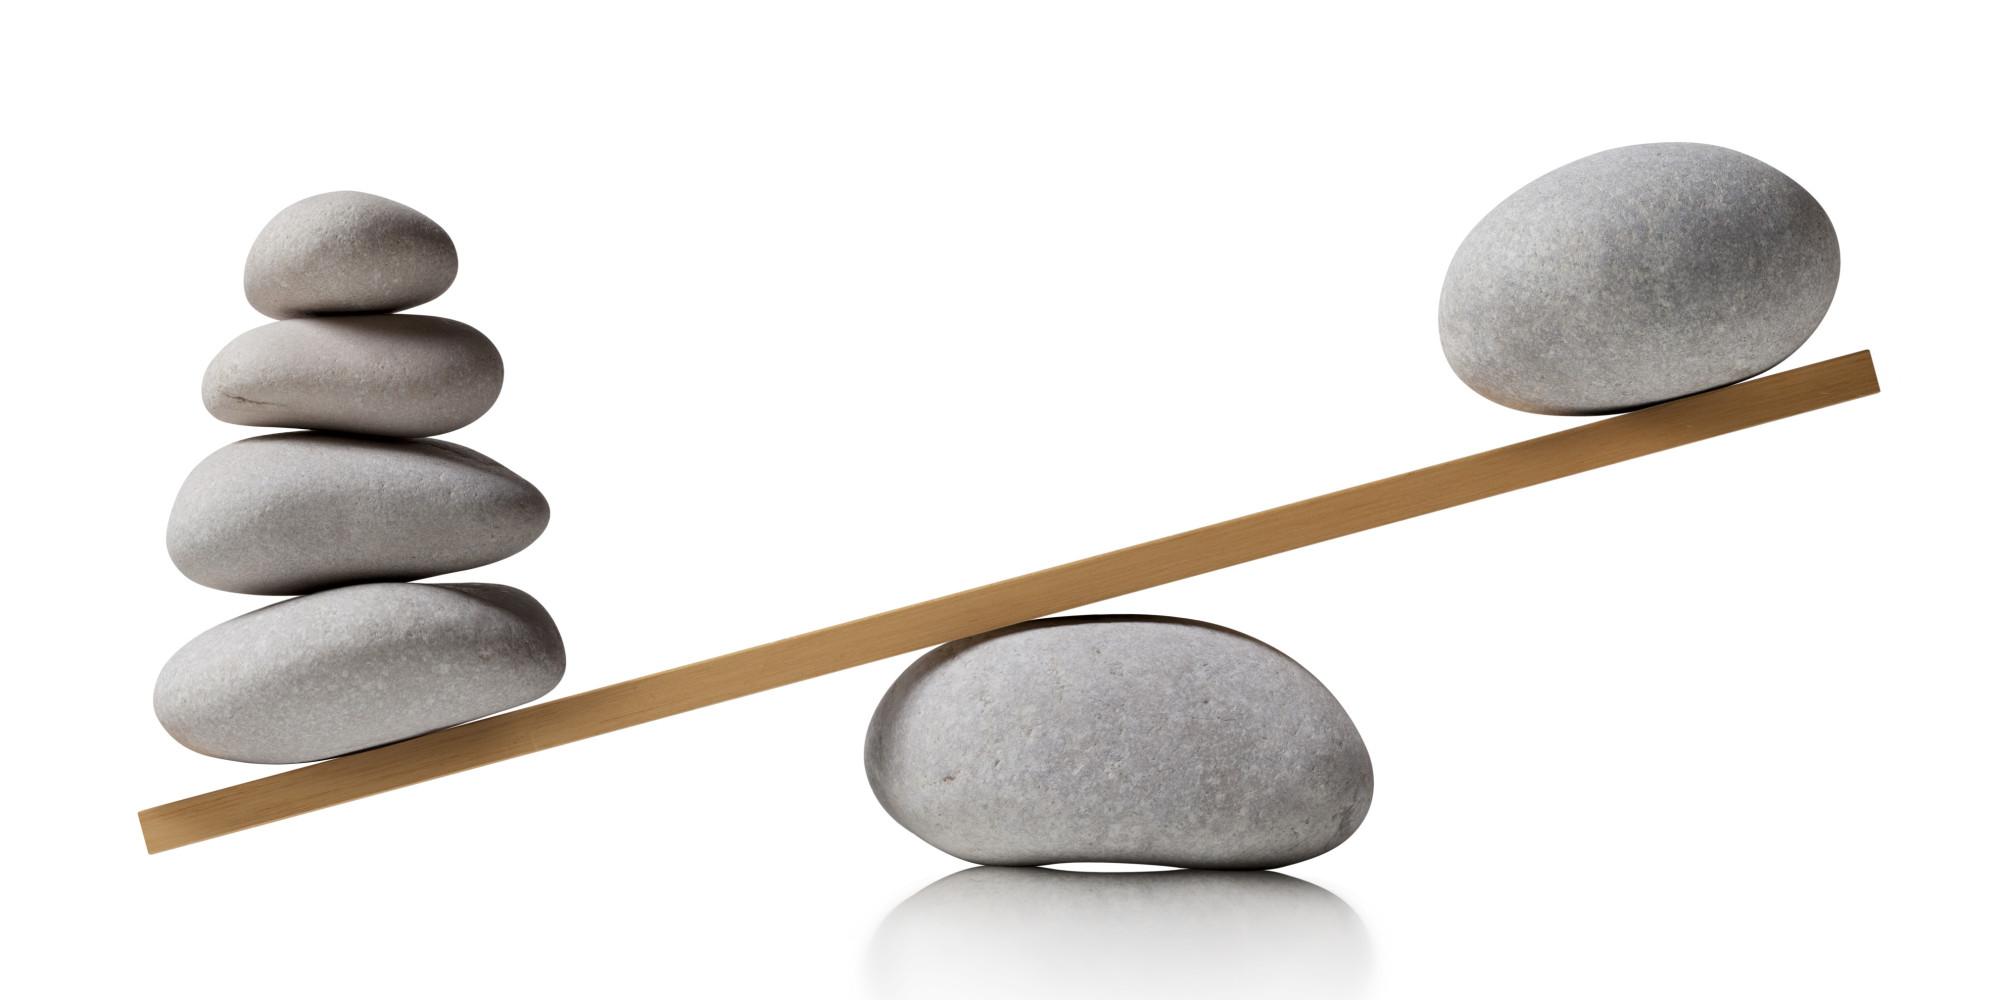 o-balance-scale-facebook.jpg